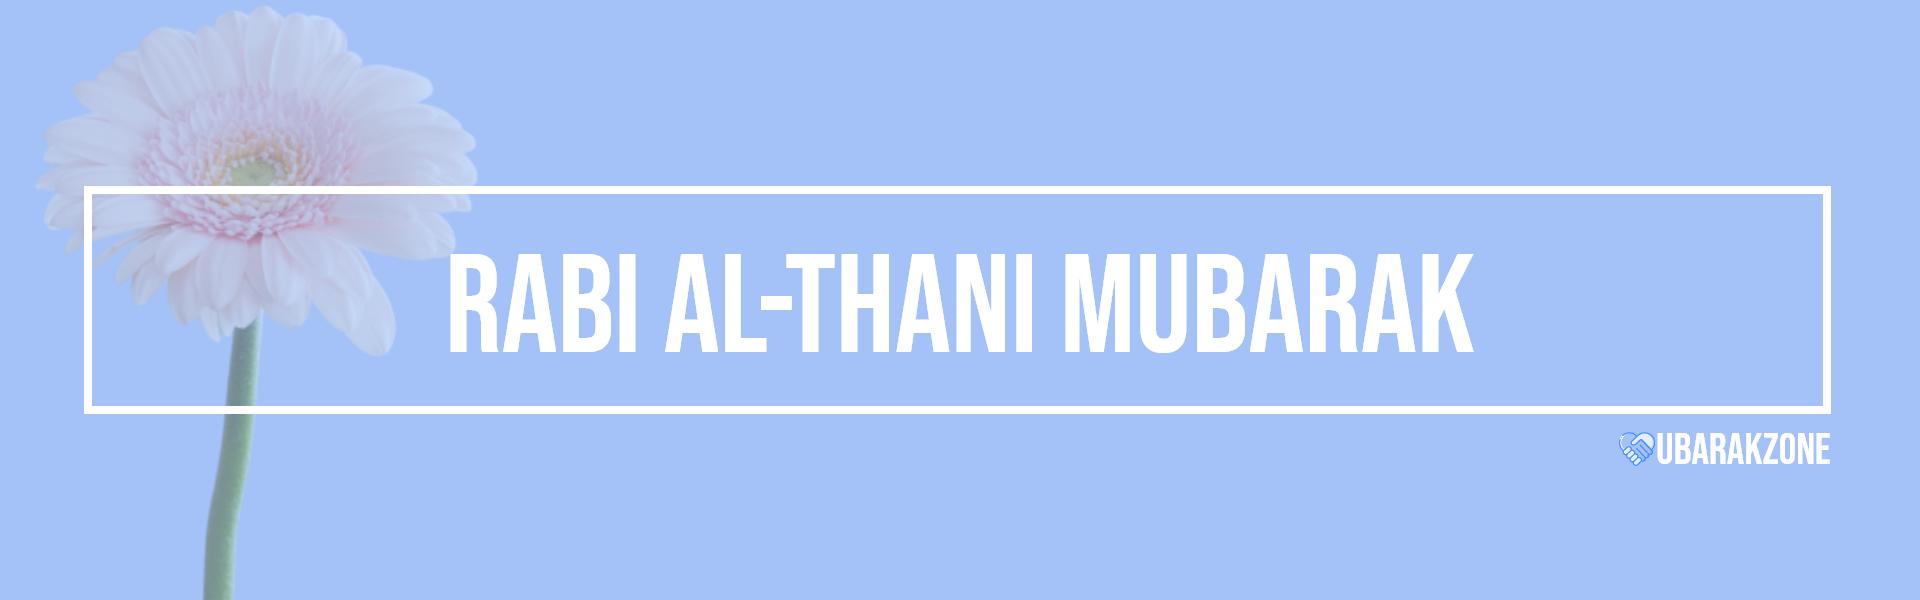 rabi al-thani mubarak wishes messages